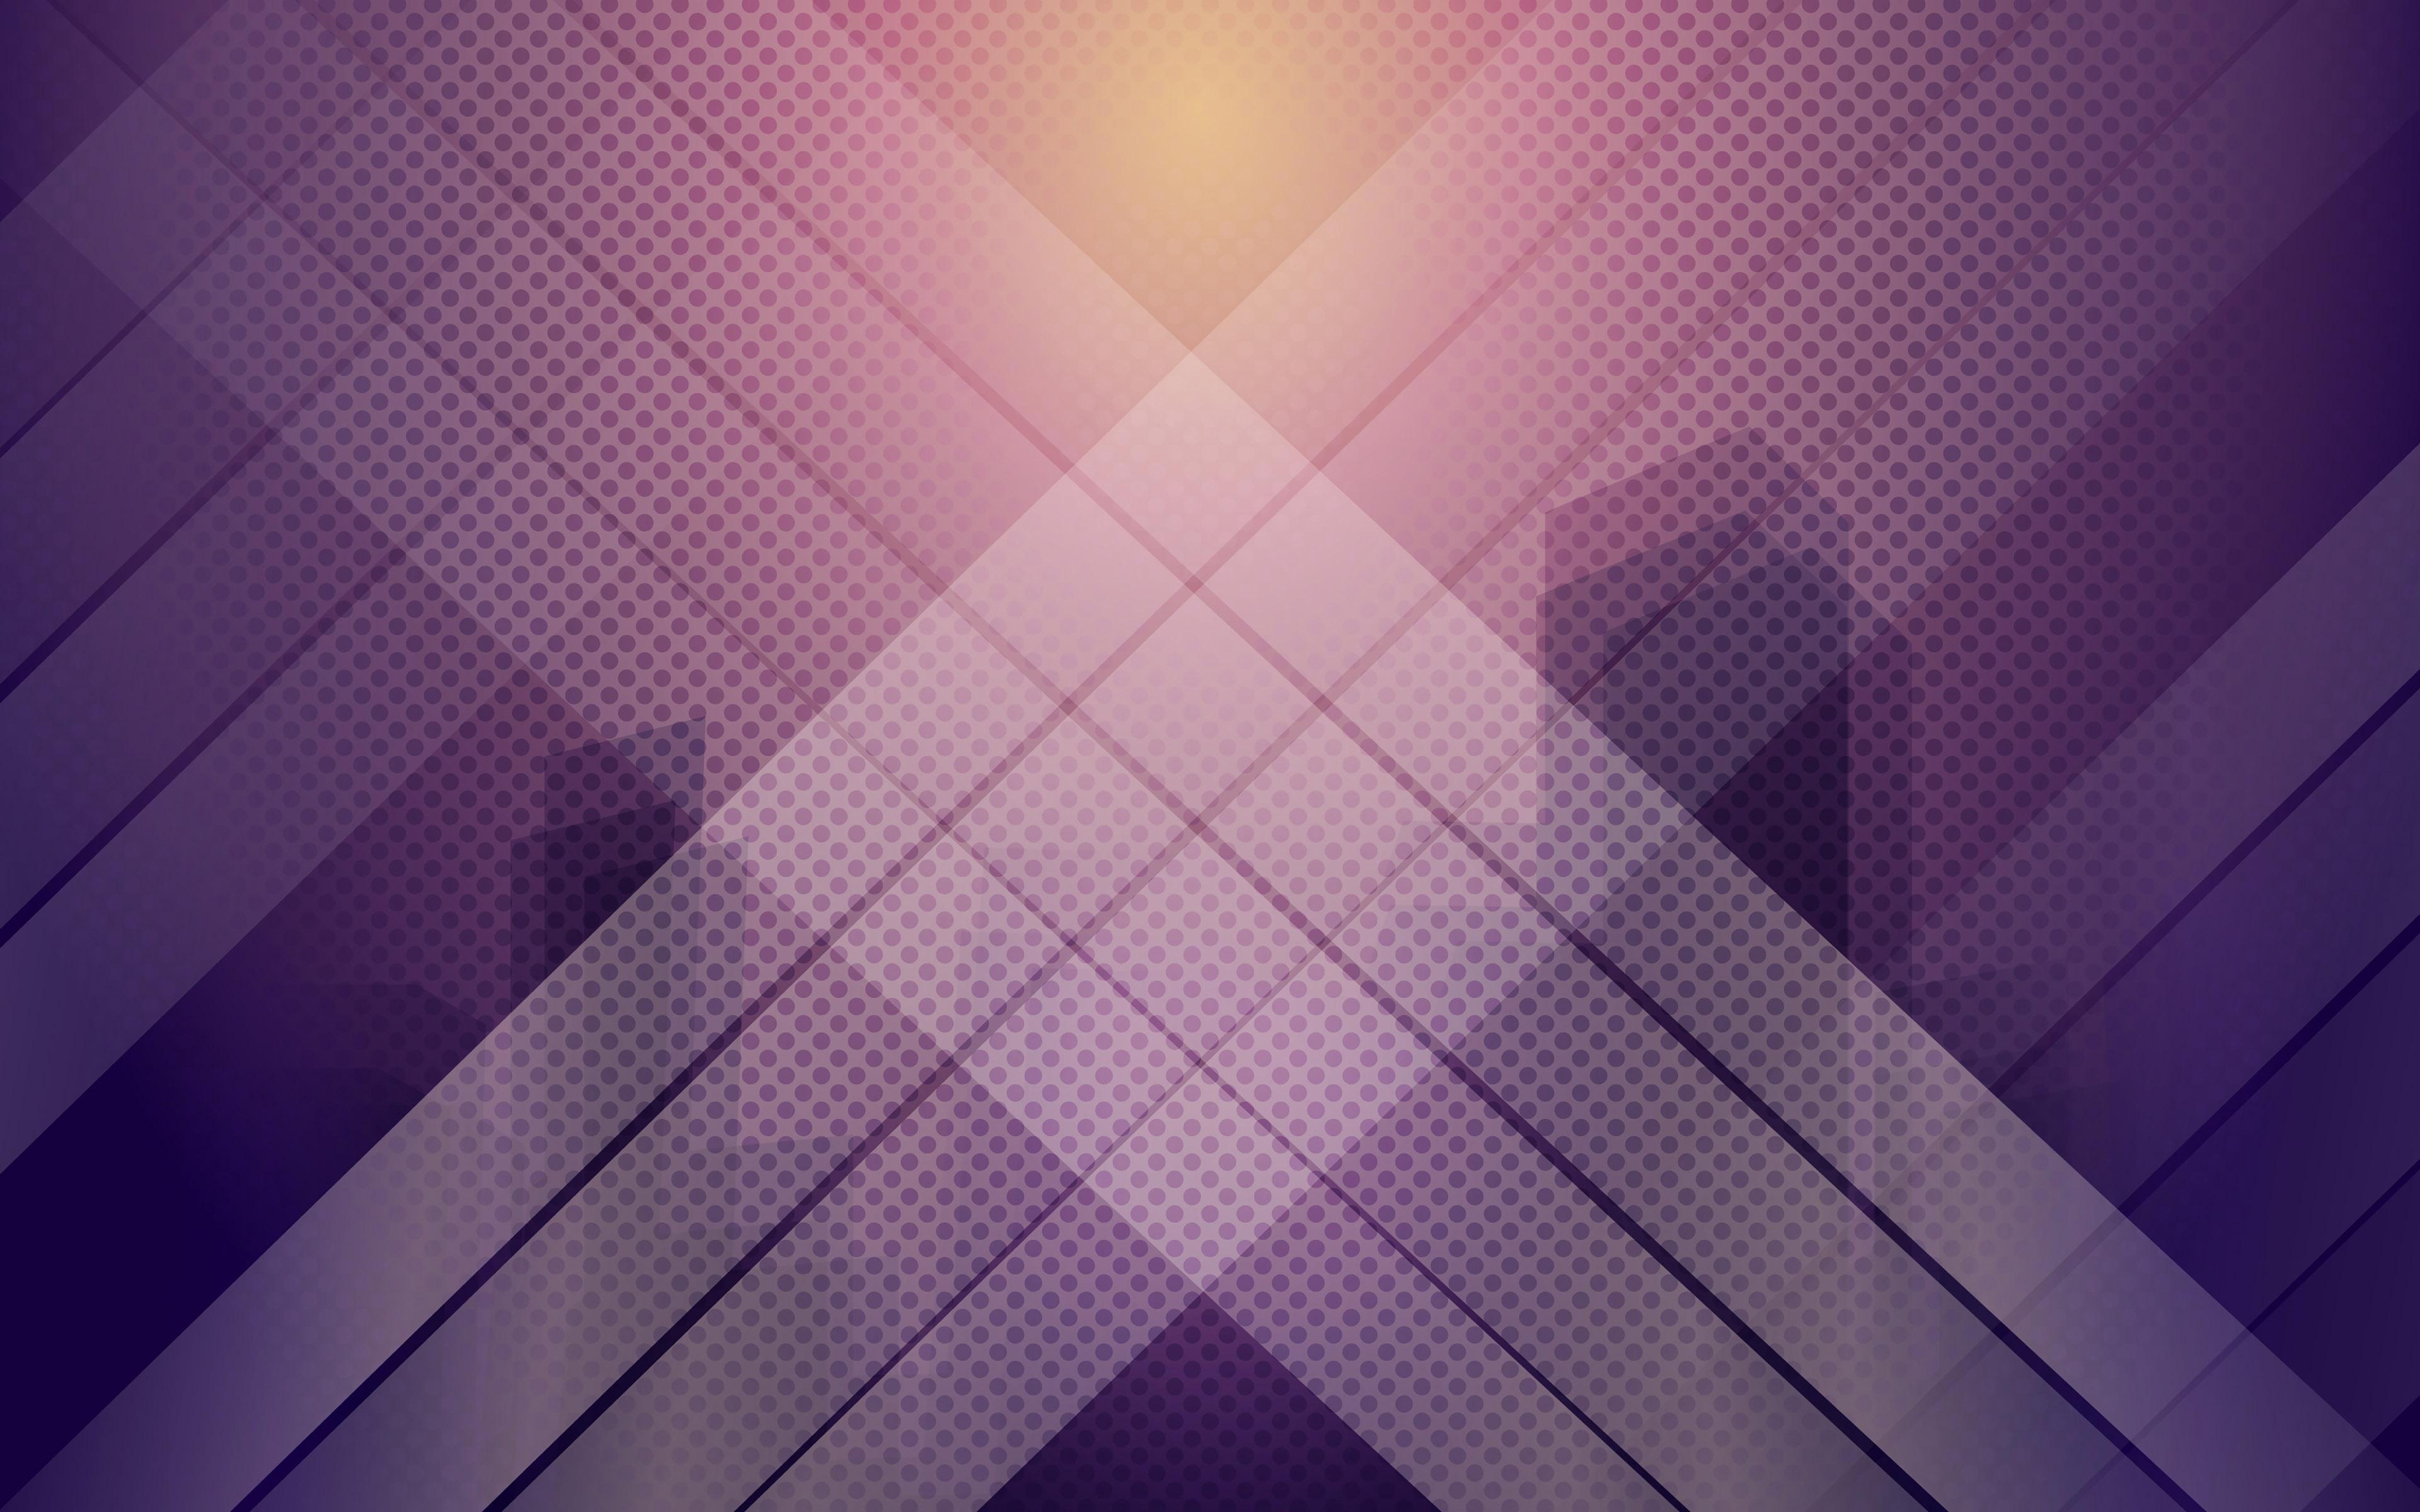 Simple Wallpaper Macbook Light - papers  Snapshot_526183.jpg